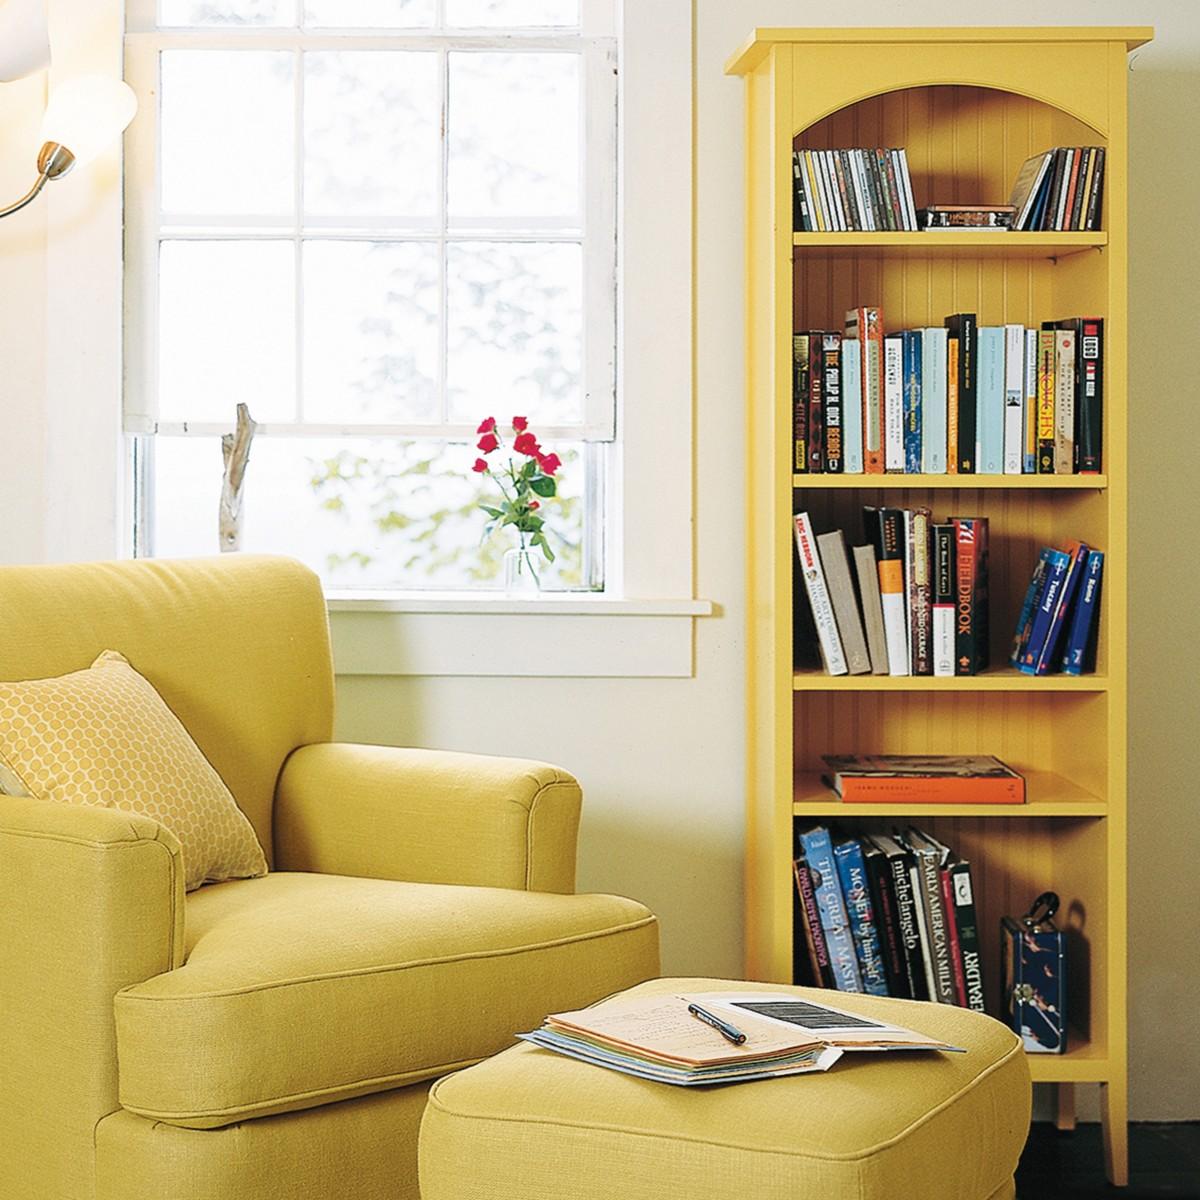 Skinniest Island Bookshelf